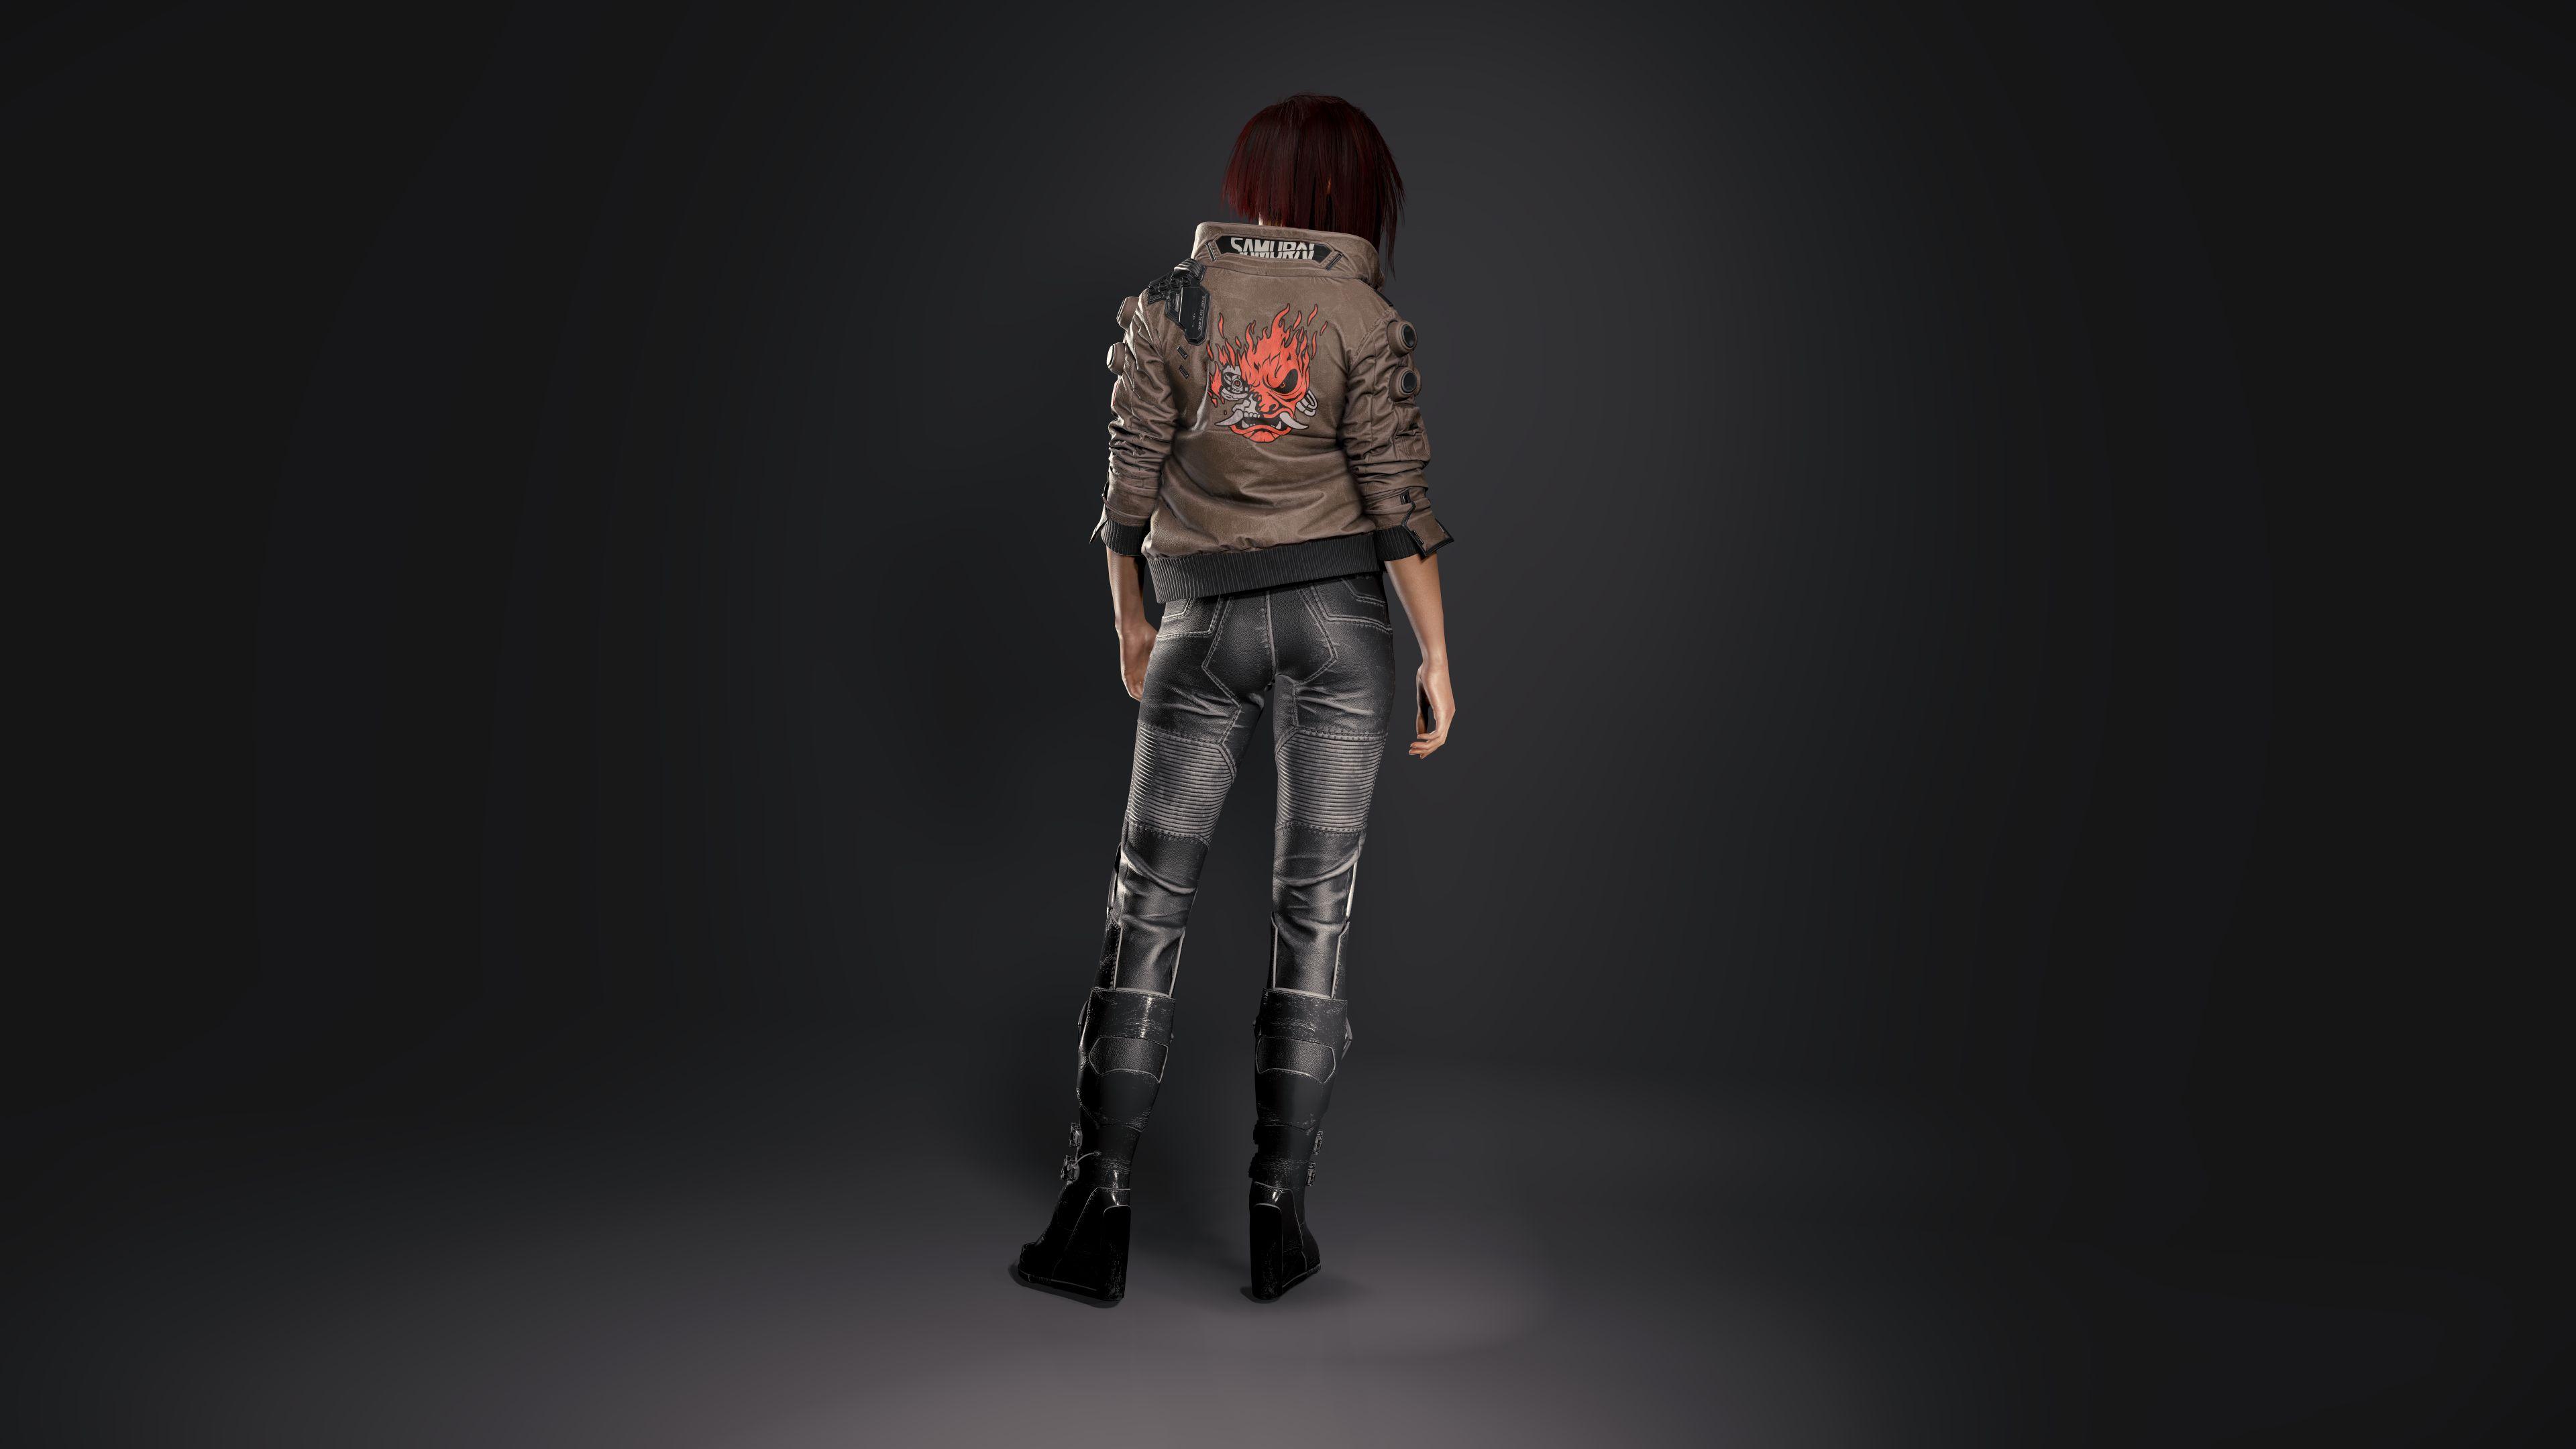 Cyberpunk-2077-Character 2